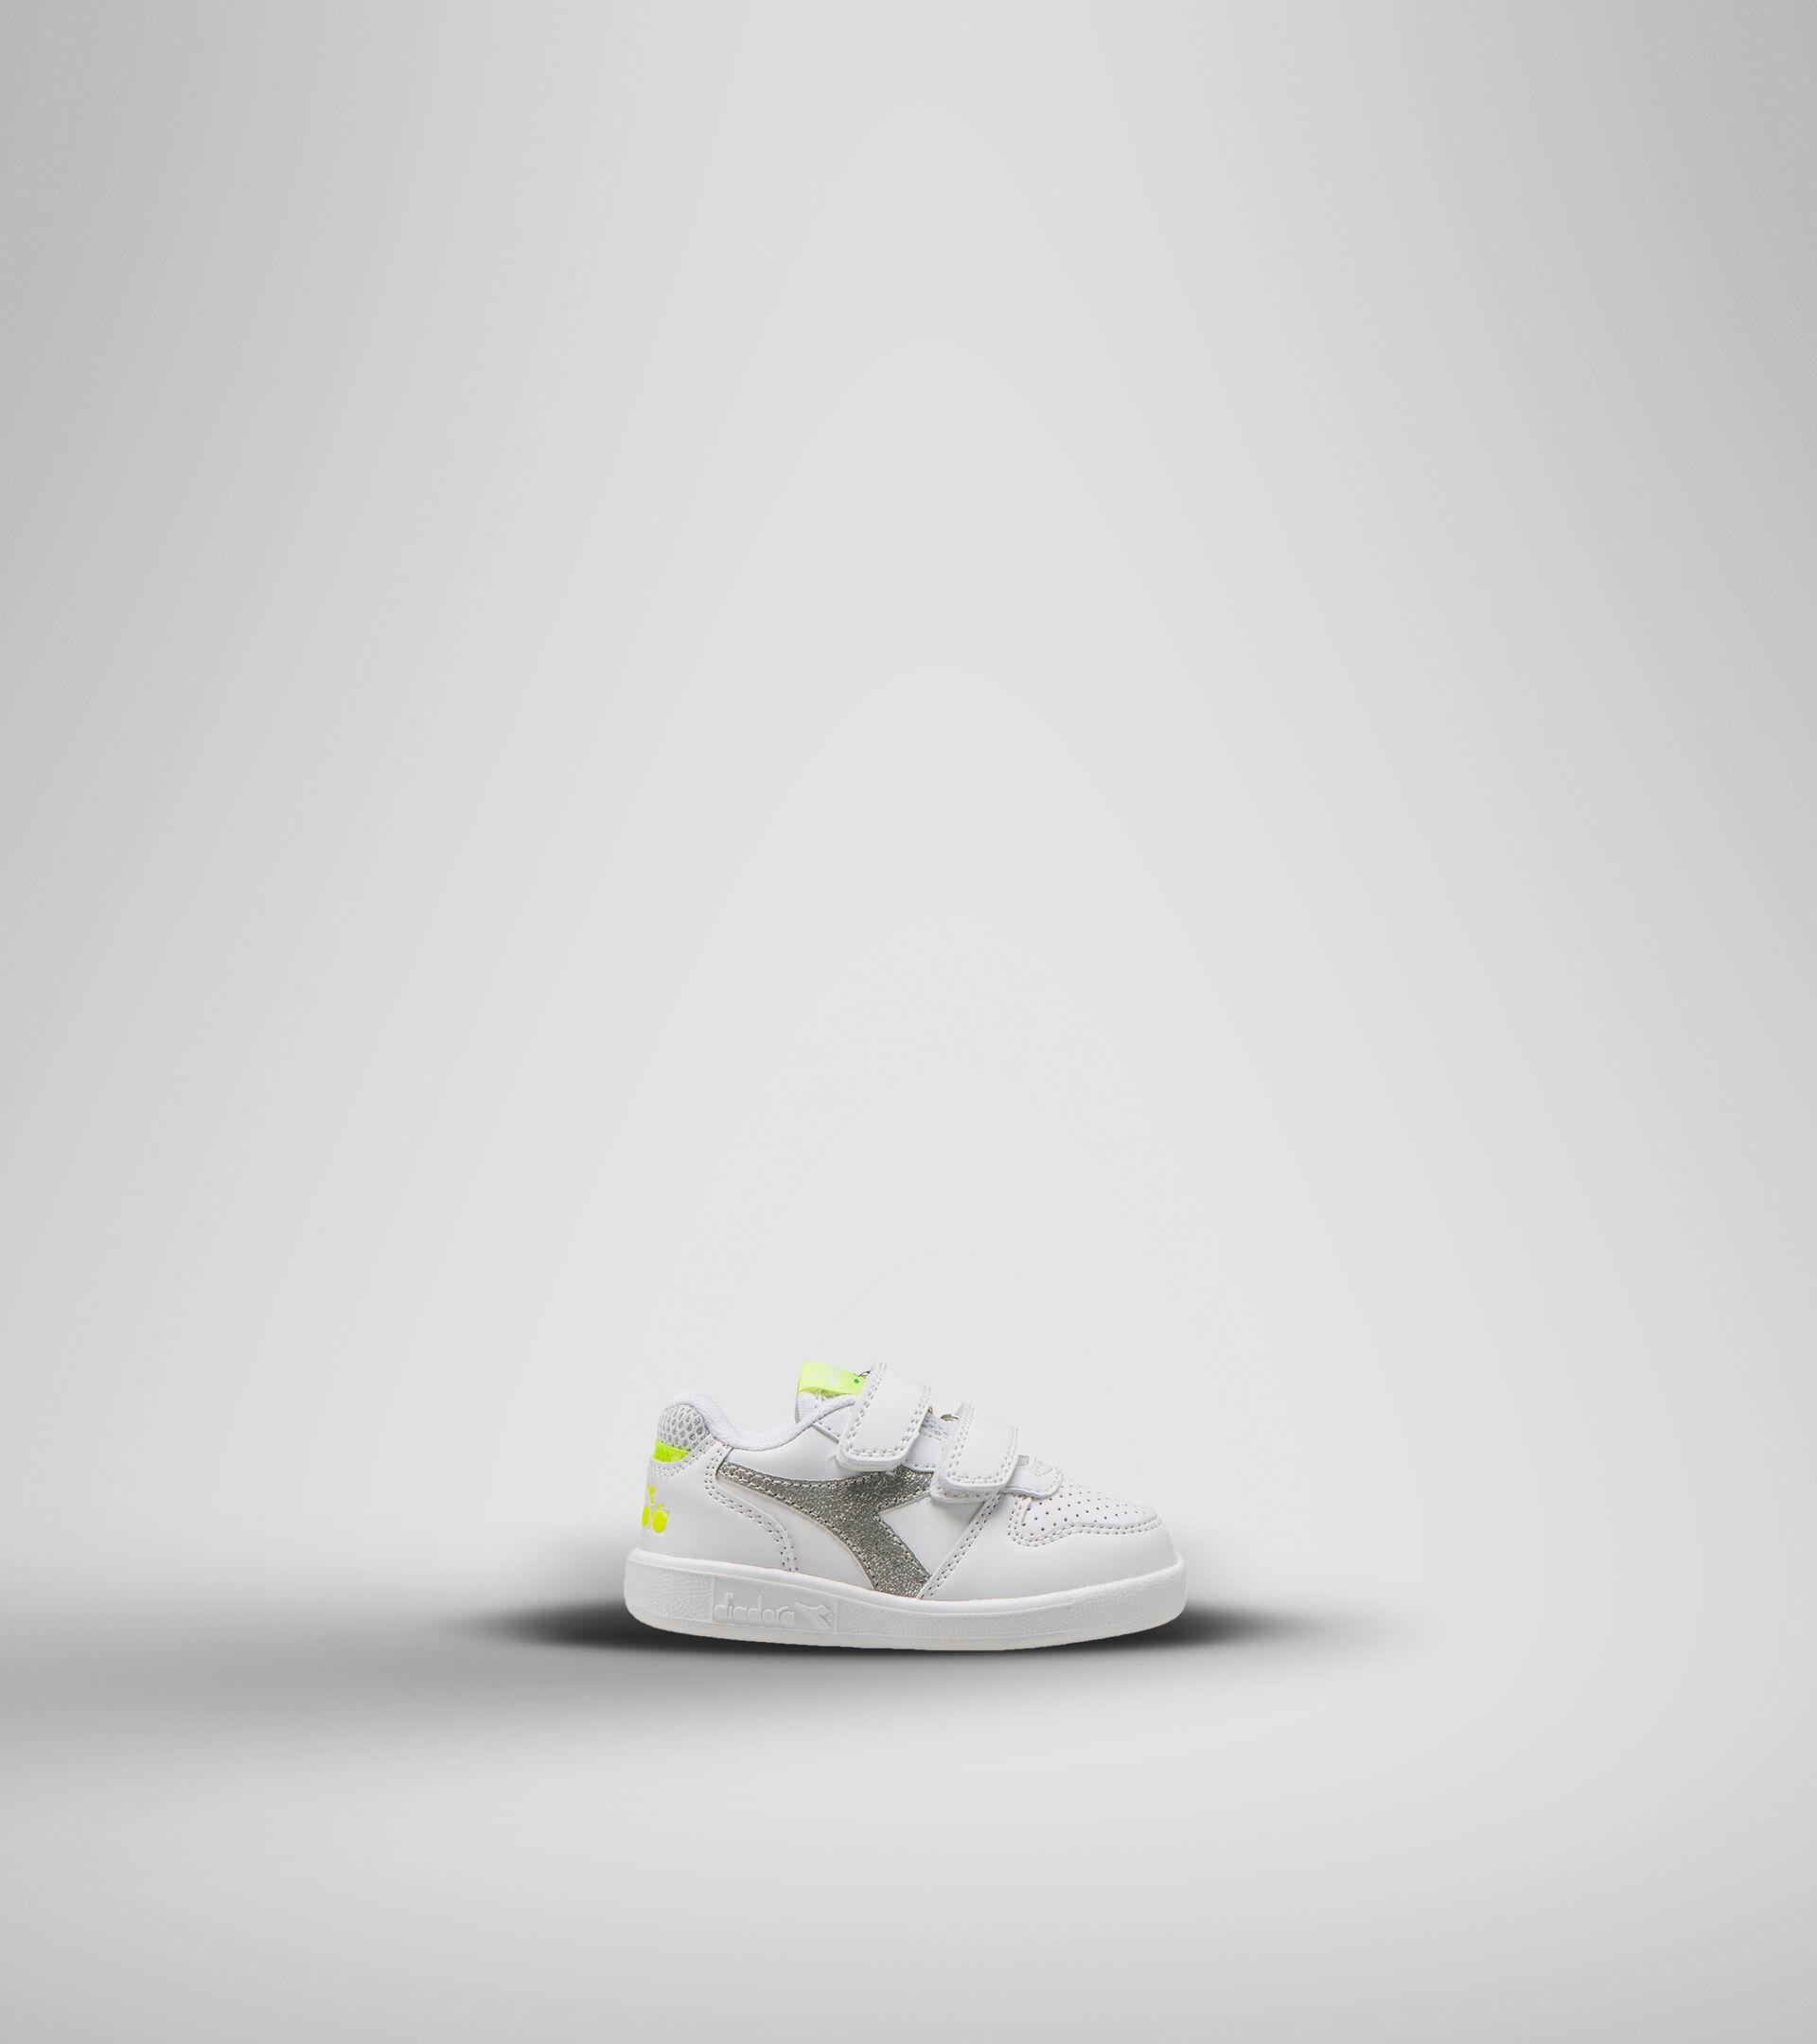 Footwear Sport BAMBINO PLAYGROUND TD GIRL WHITE/YELLOW FLUO. Diadora